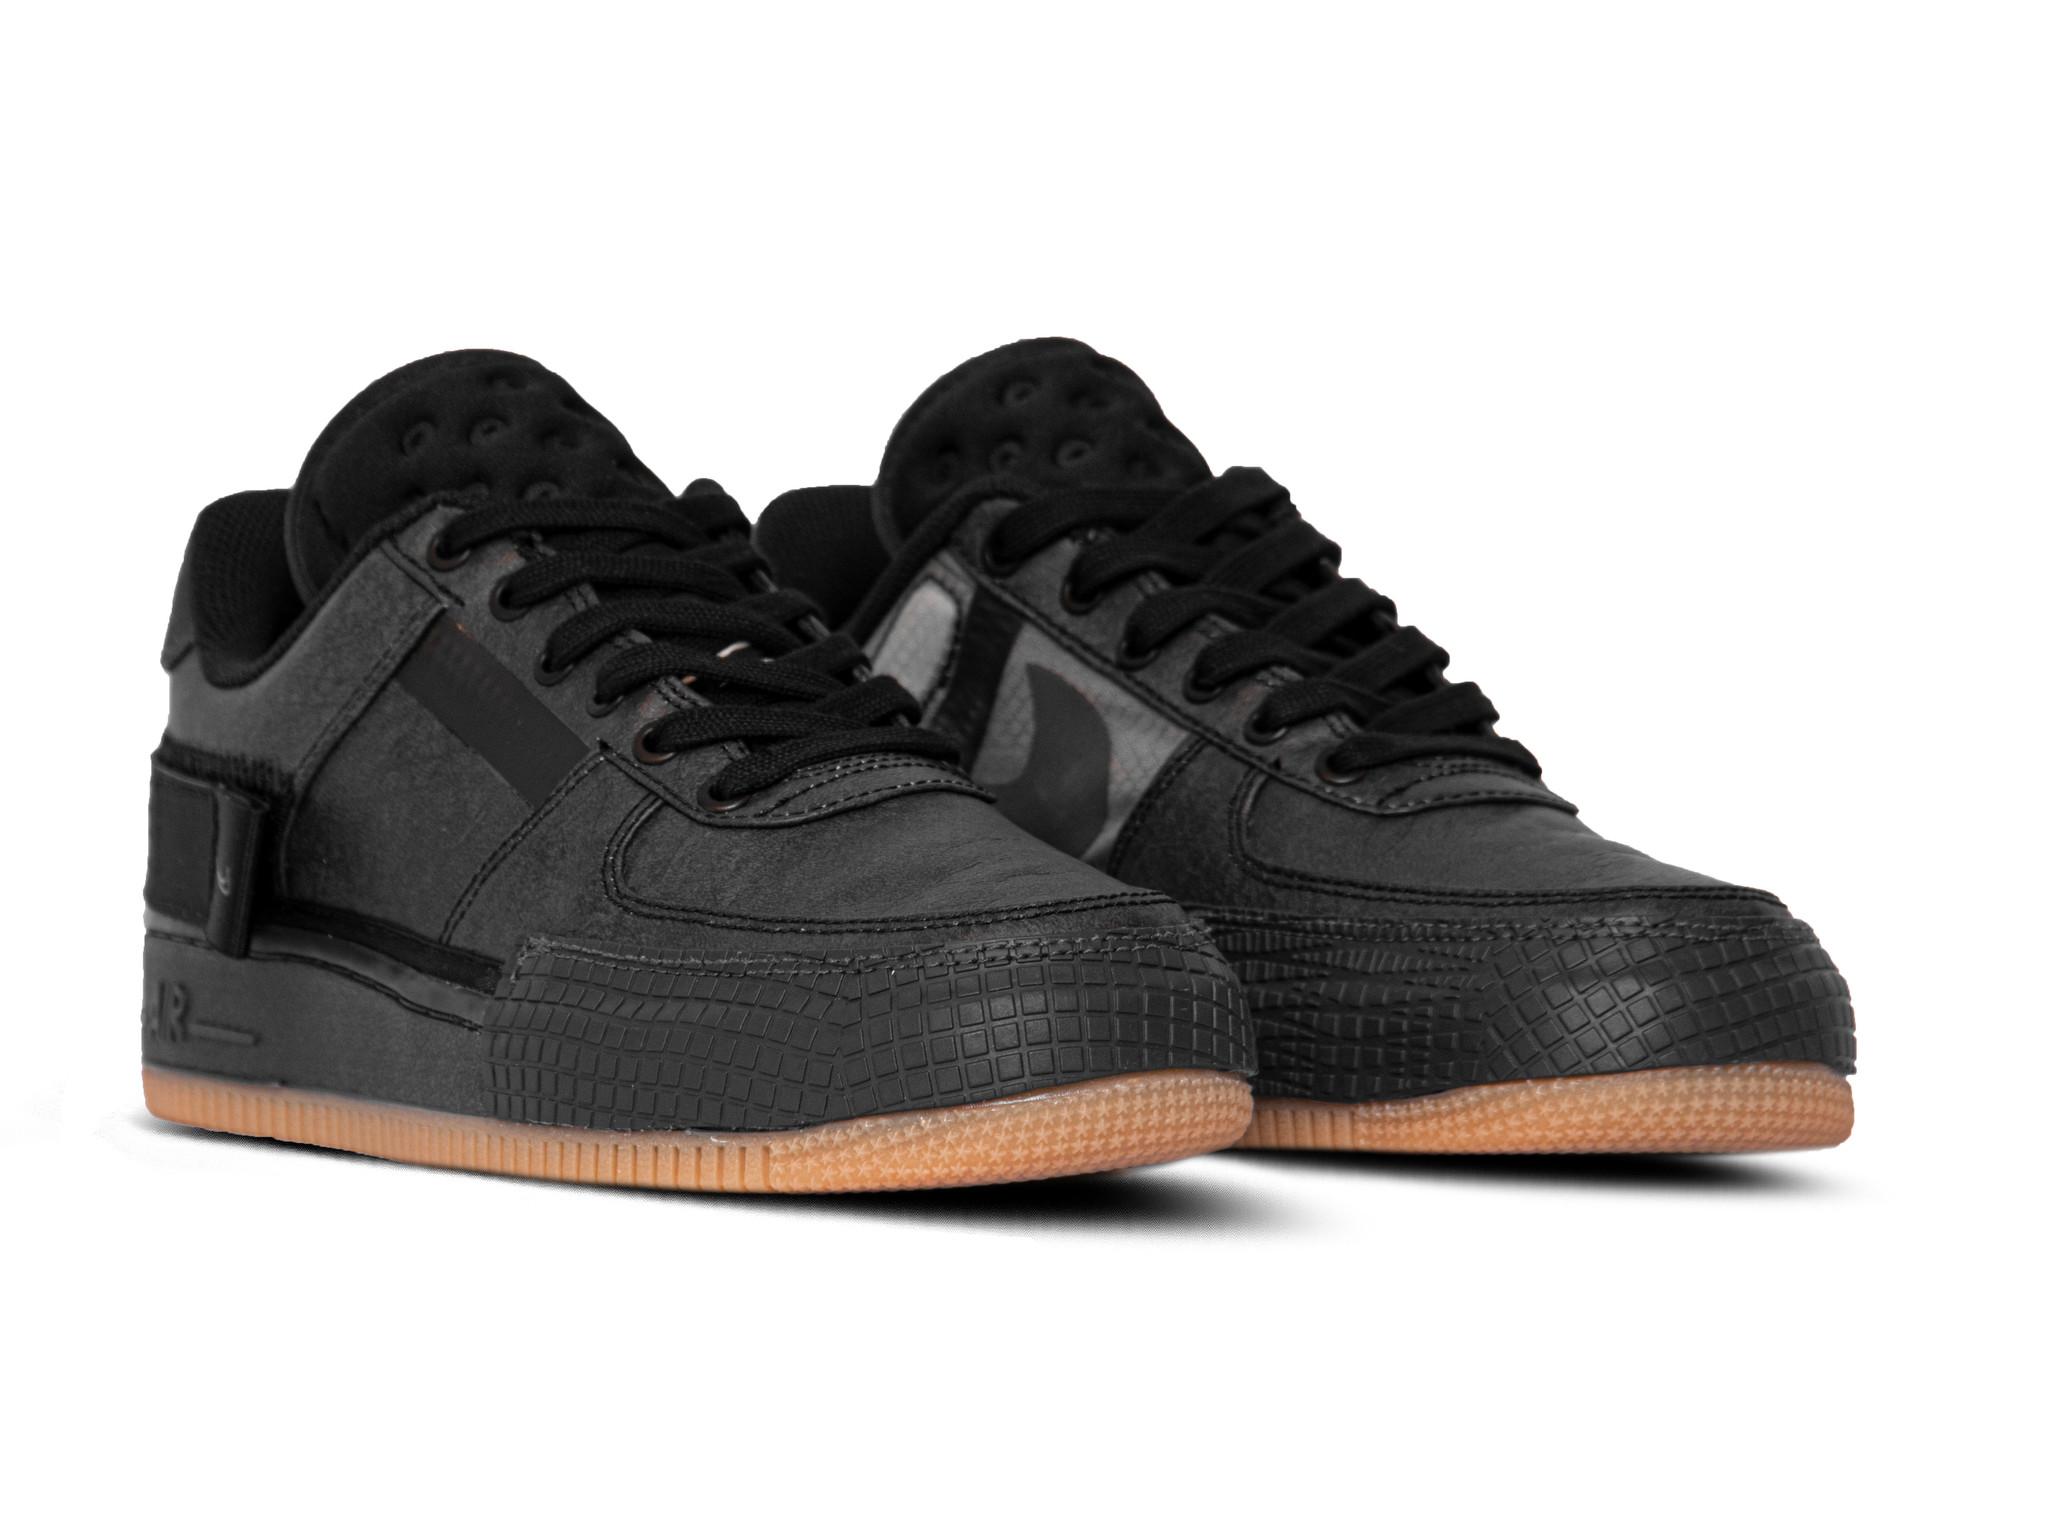 Nike Air Force 1 Type 1 Black